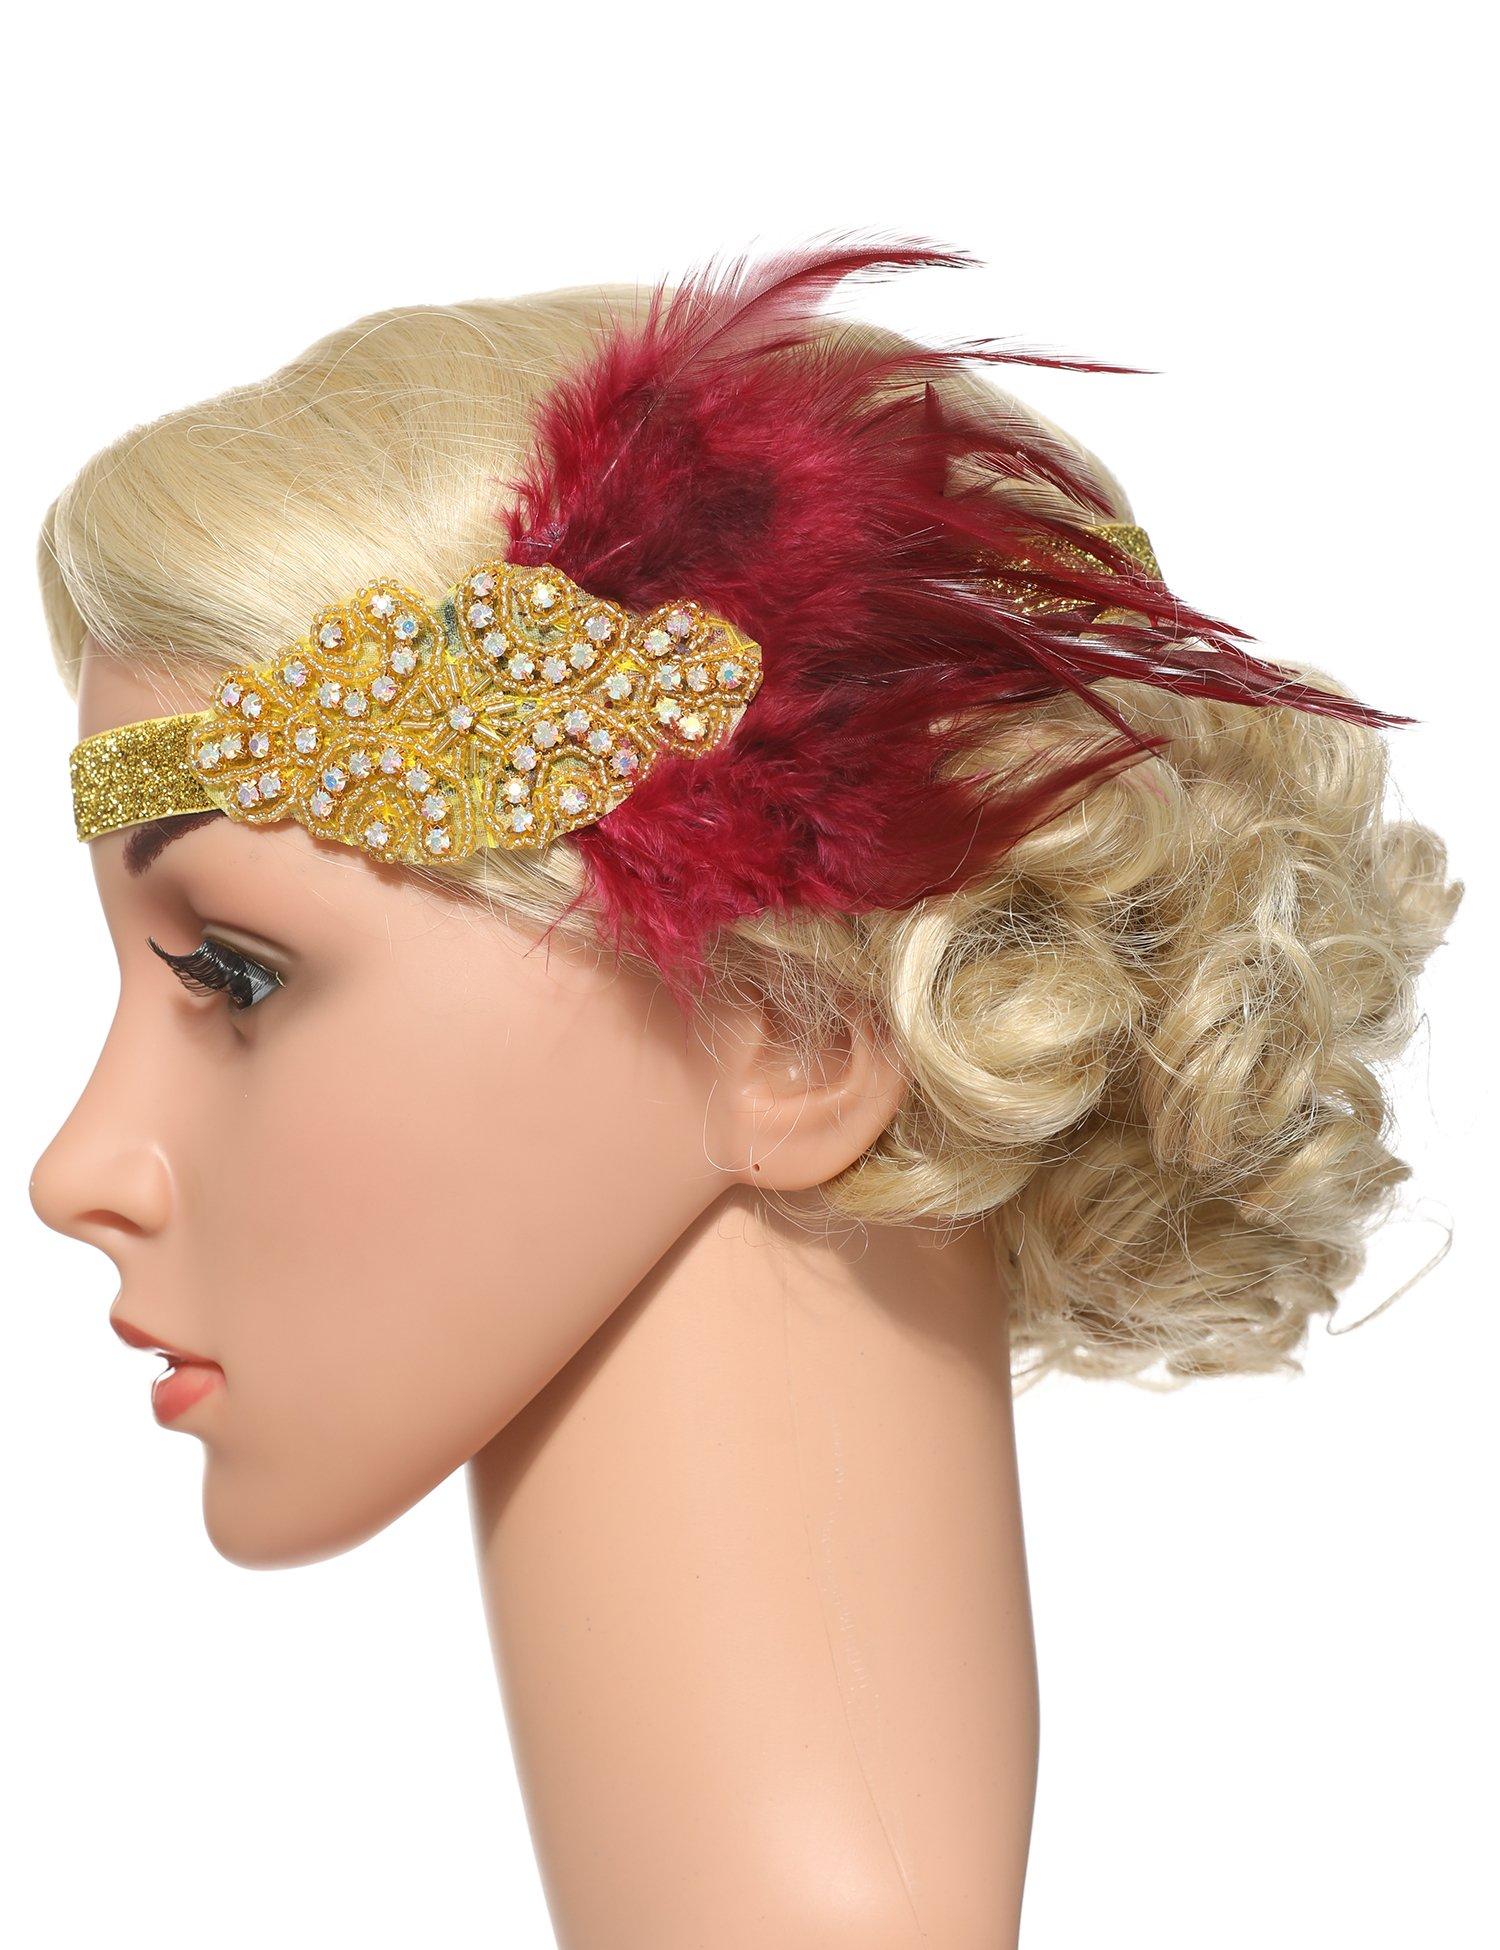 Flapper Girl Feather Flapper Headpiece Wedding 1920s Gatsby Headbands Crystal (WineRed-Gold)